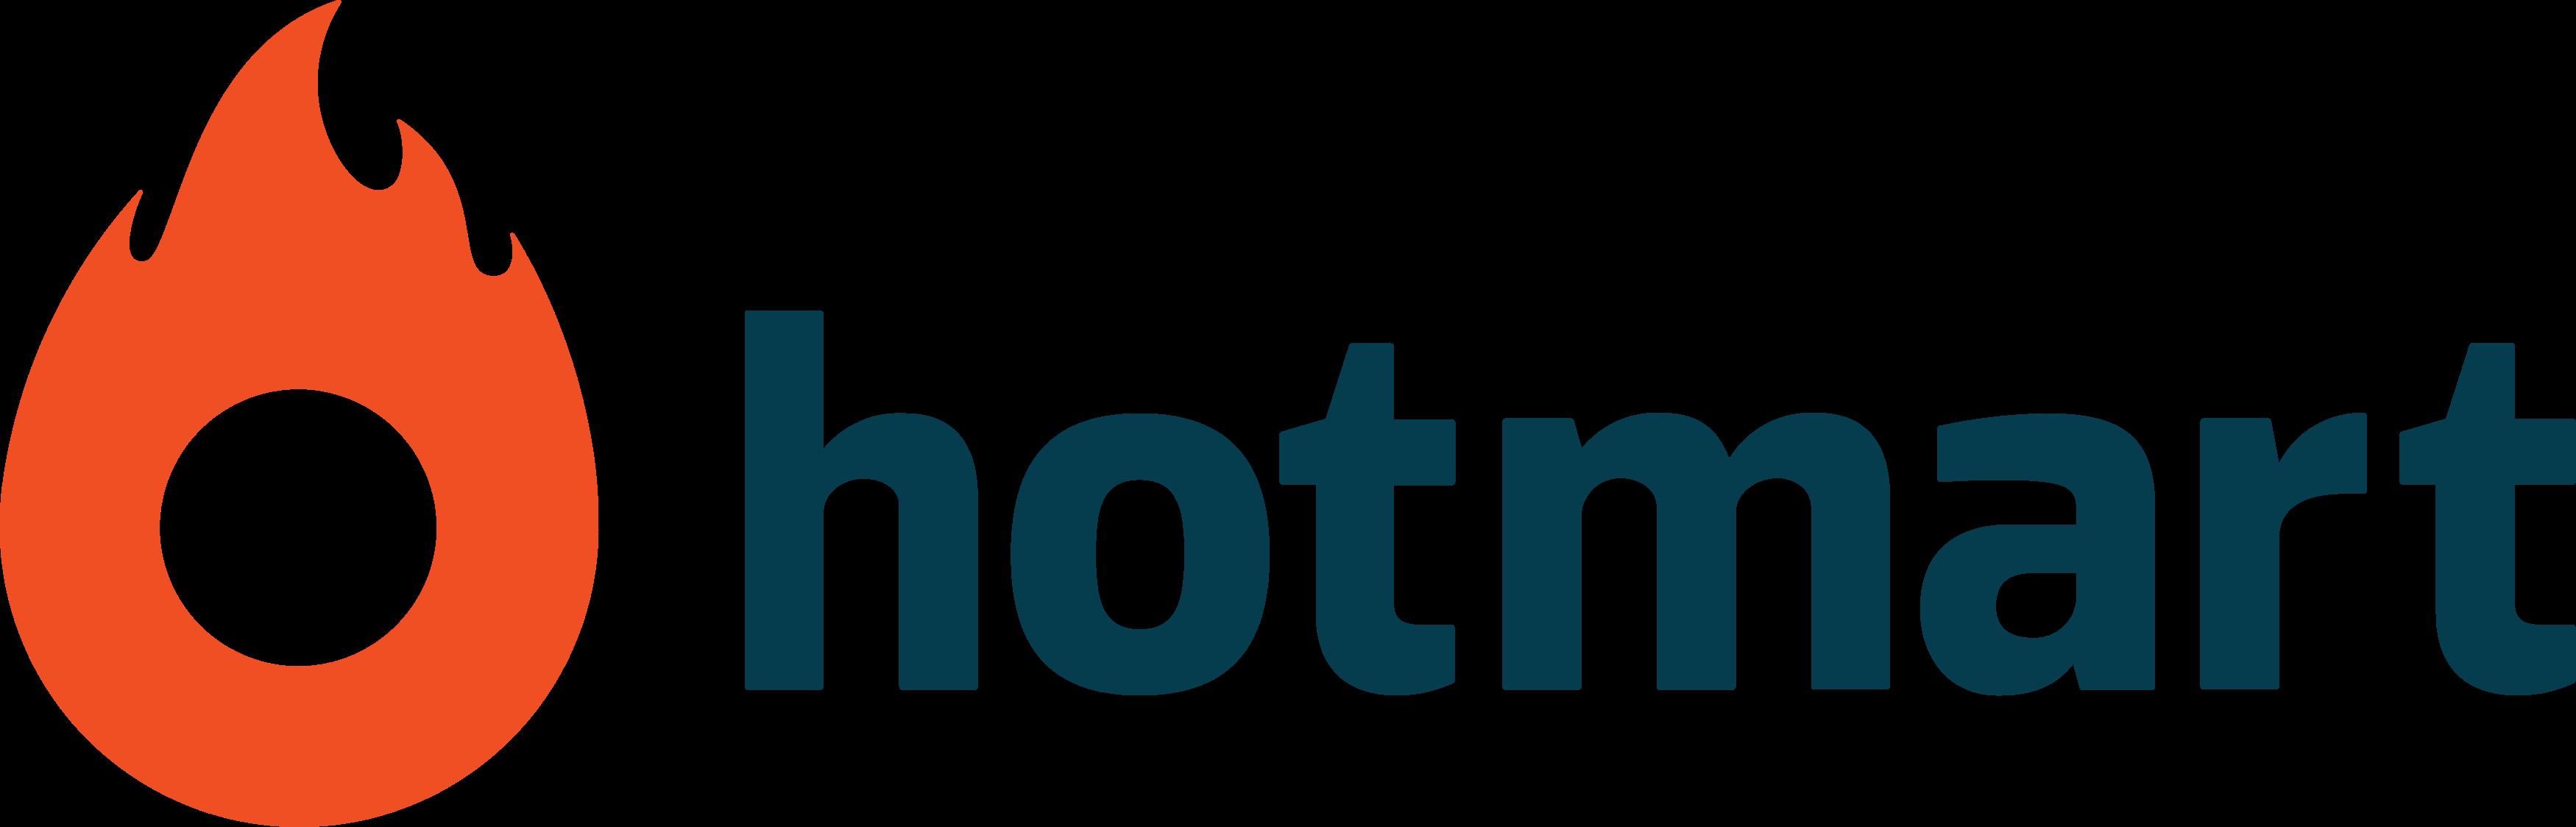 hotmart-logo (1)